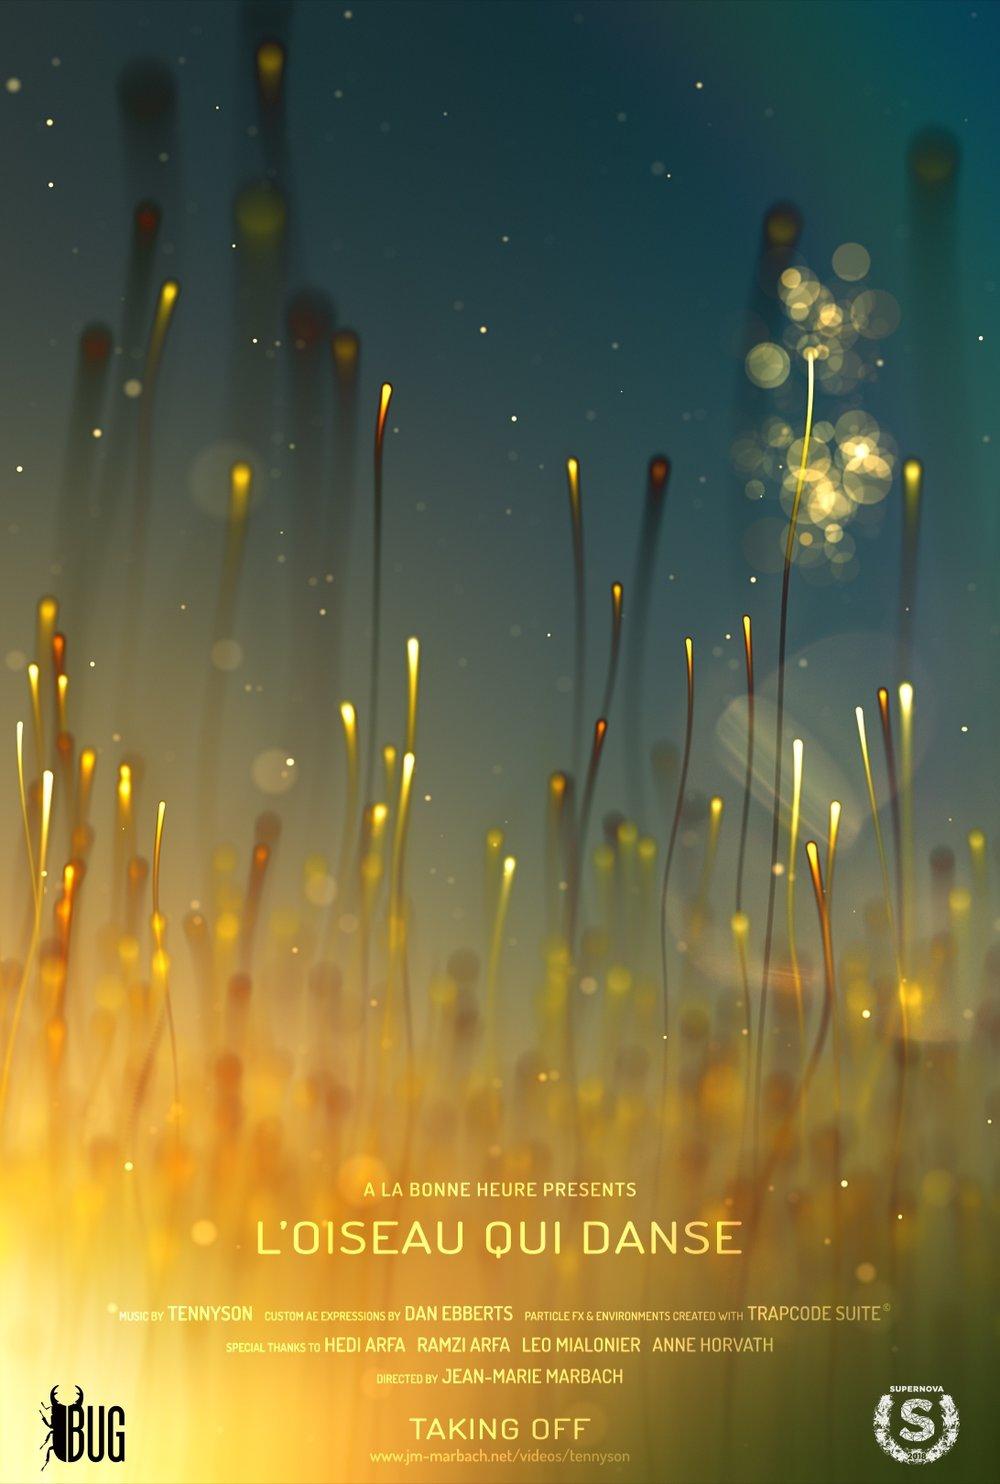 Tennyson_L'oiseau_qui_danse_poster..